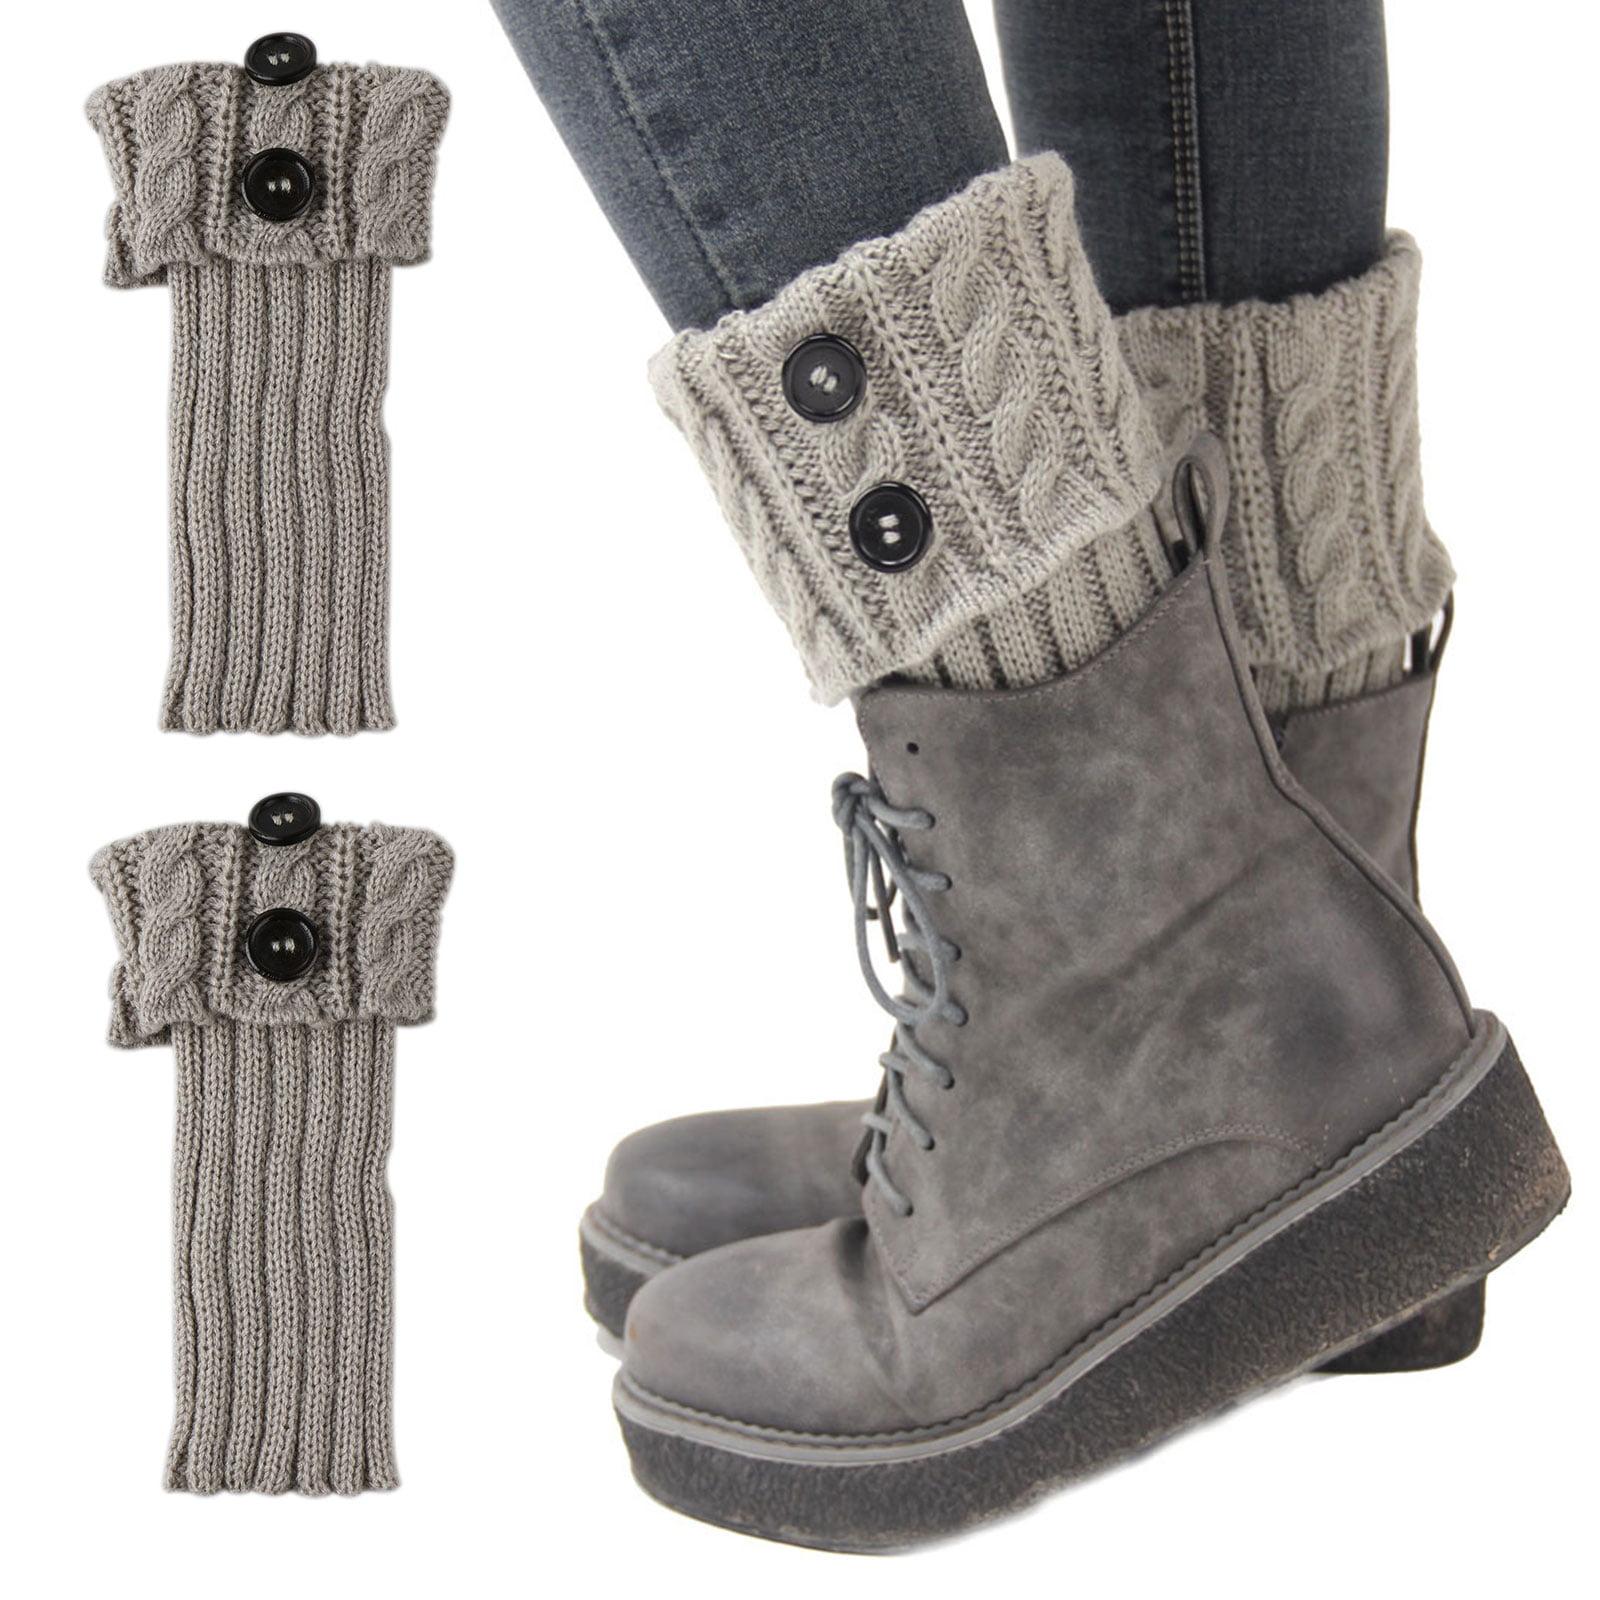 1 Pairs Womens Short Boots Socks Crochet Knitted Boot Cuffs Leg Warmers Socks Winter Warm Cuff Socks Black/White/Gray